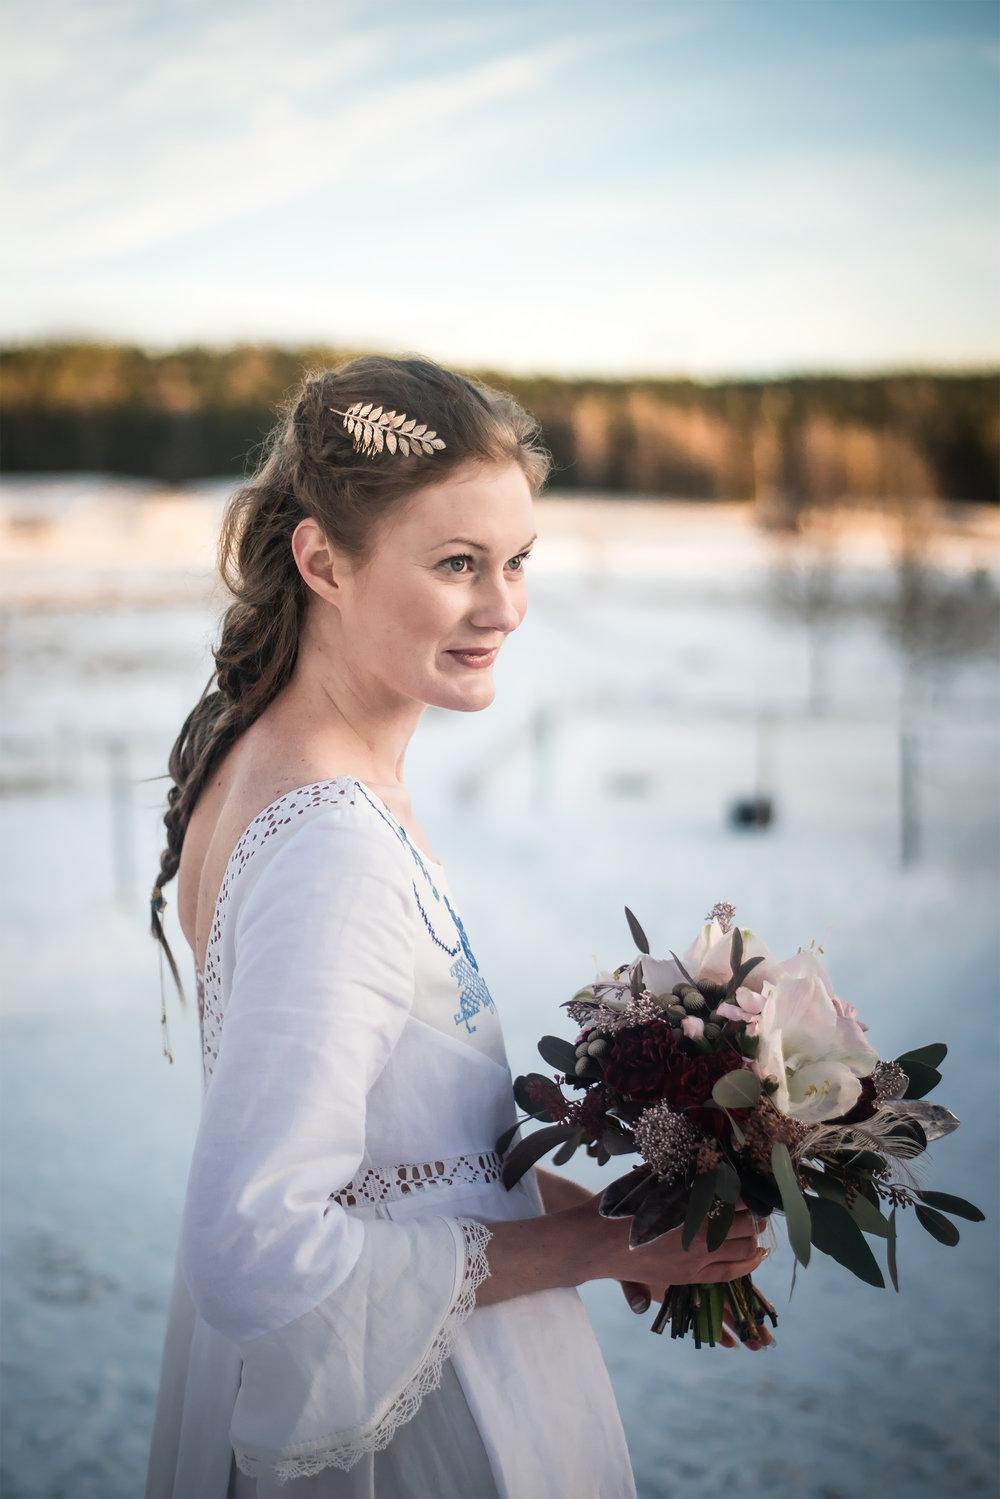 Vinterbröllop Norrland